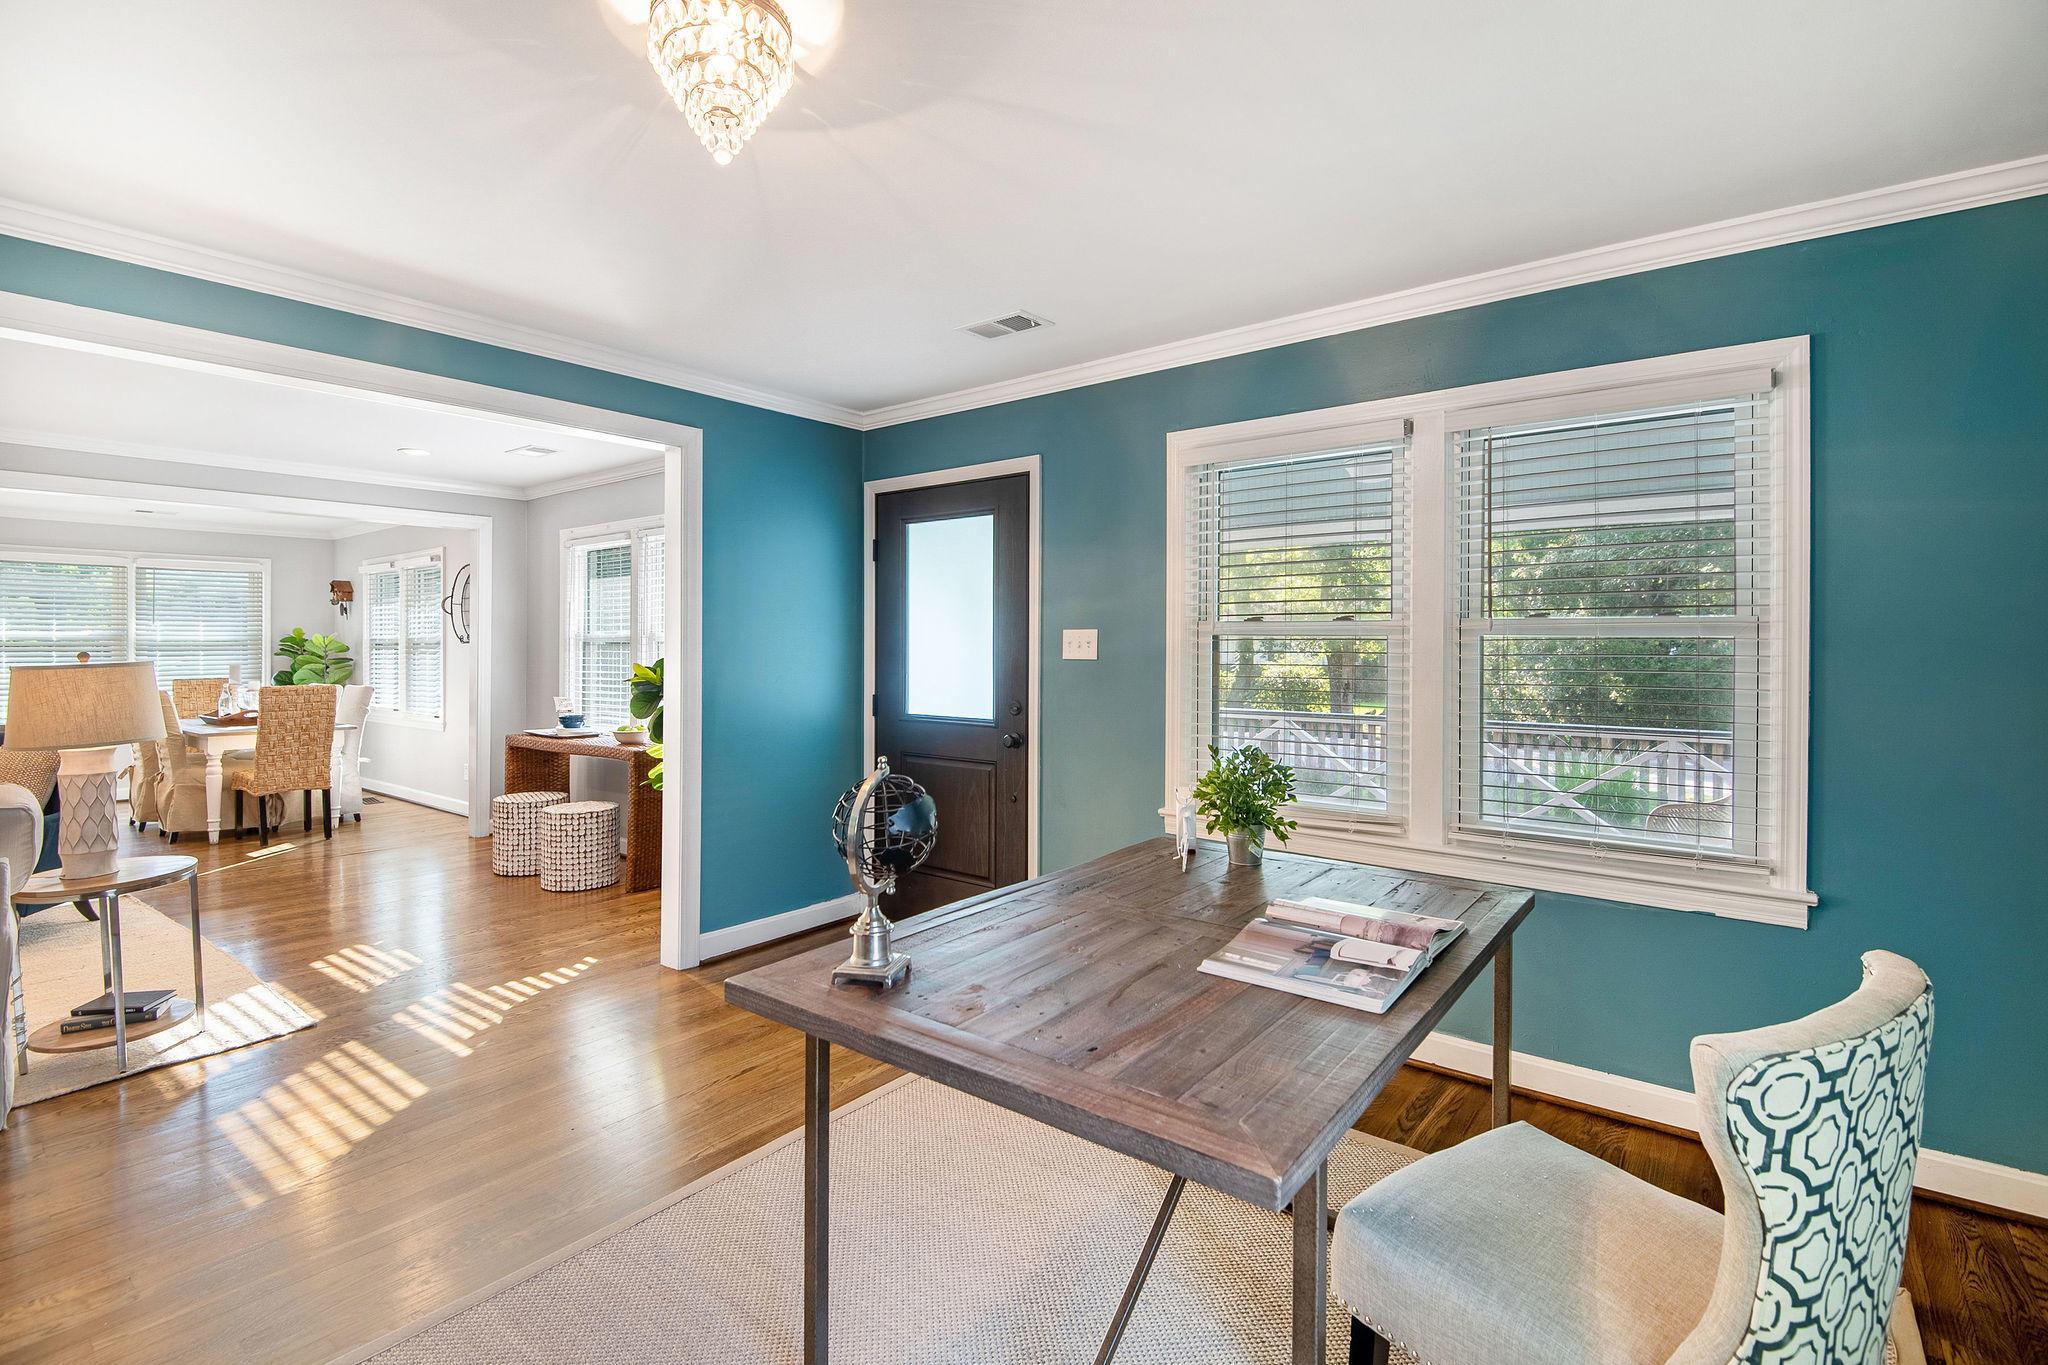 Old Mt Pleasant Homes For Sale - 914 Center, Mount Pleasant, SC - 0